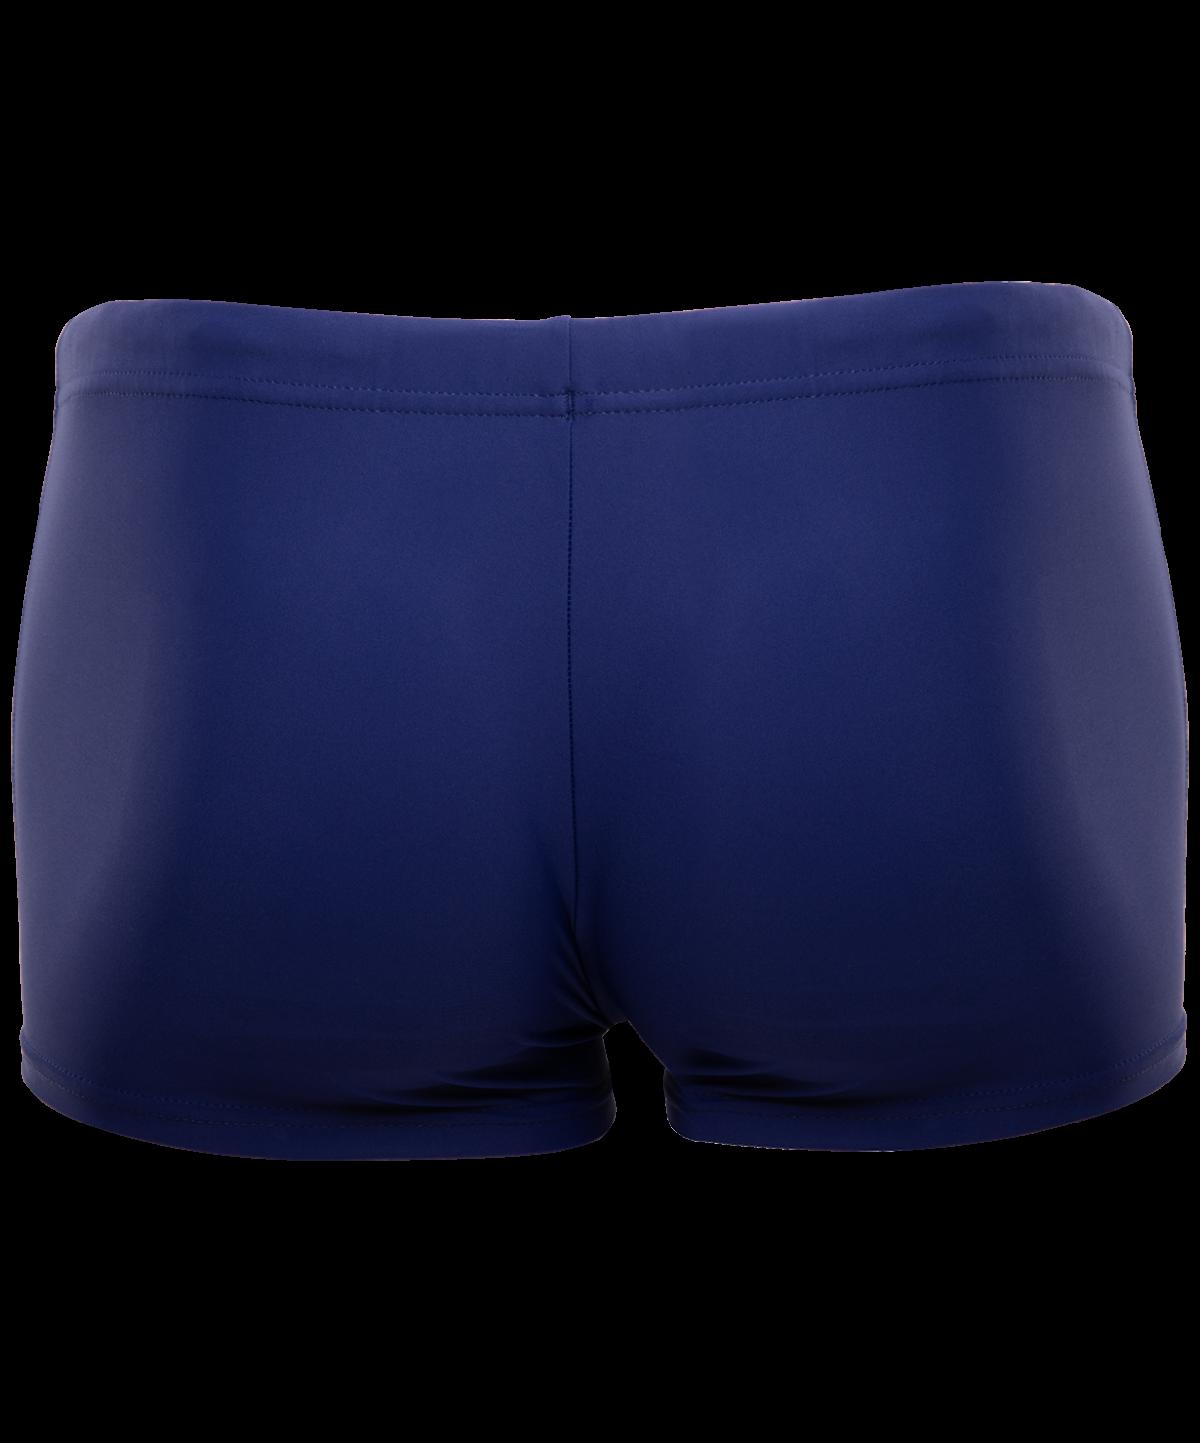 COLTON Shift Плавки-шорты мужские (44-52)  SS-1984: темно-синий - 2